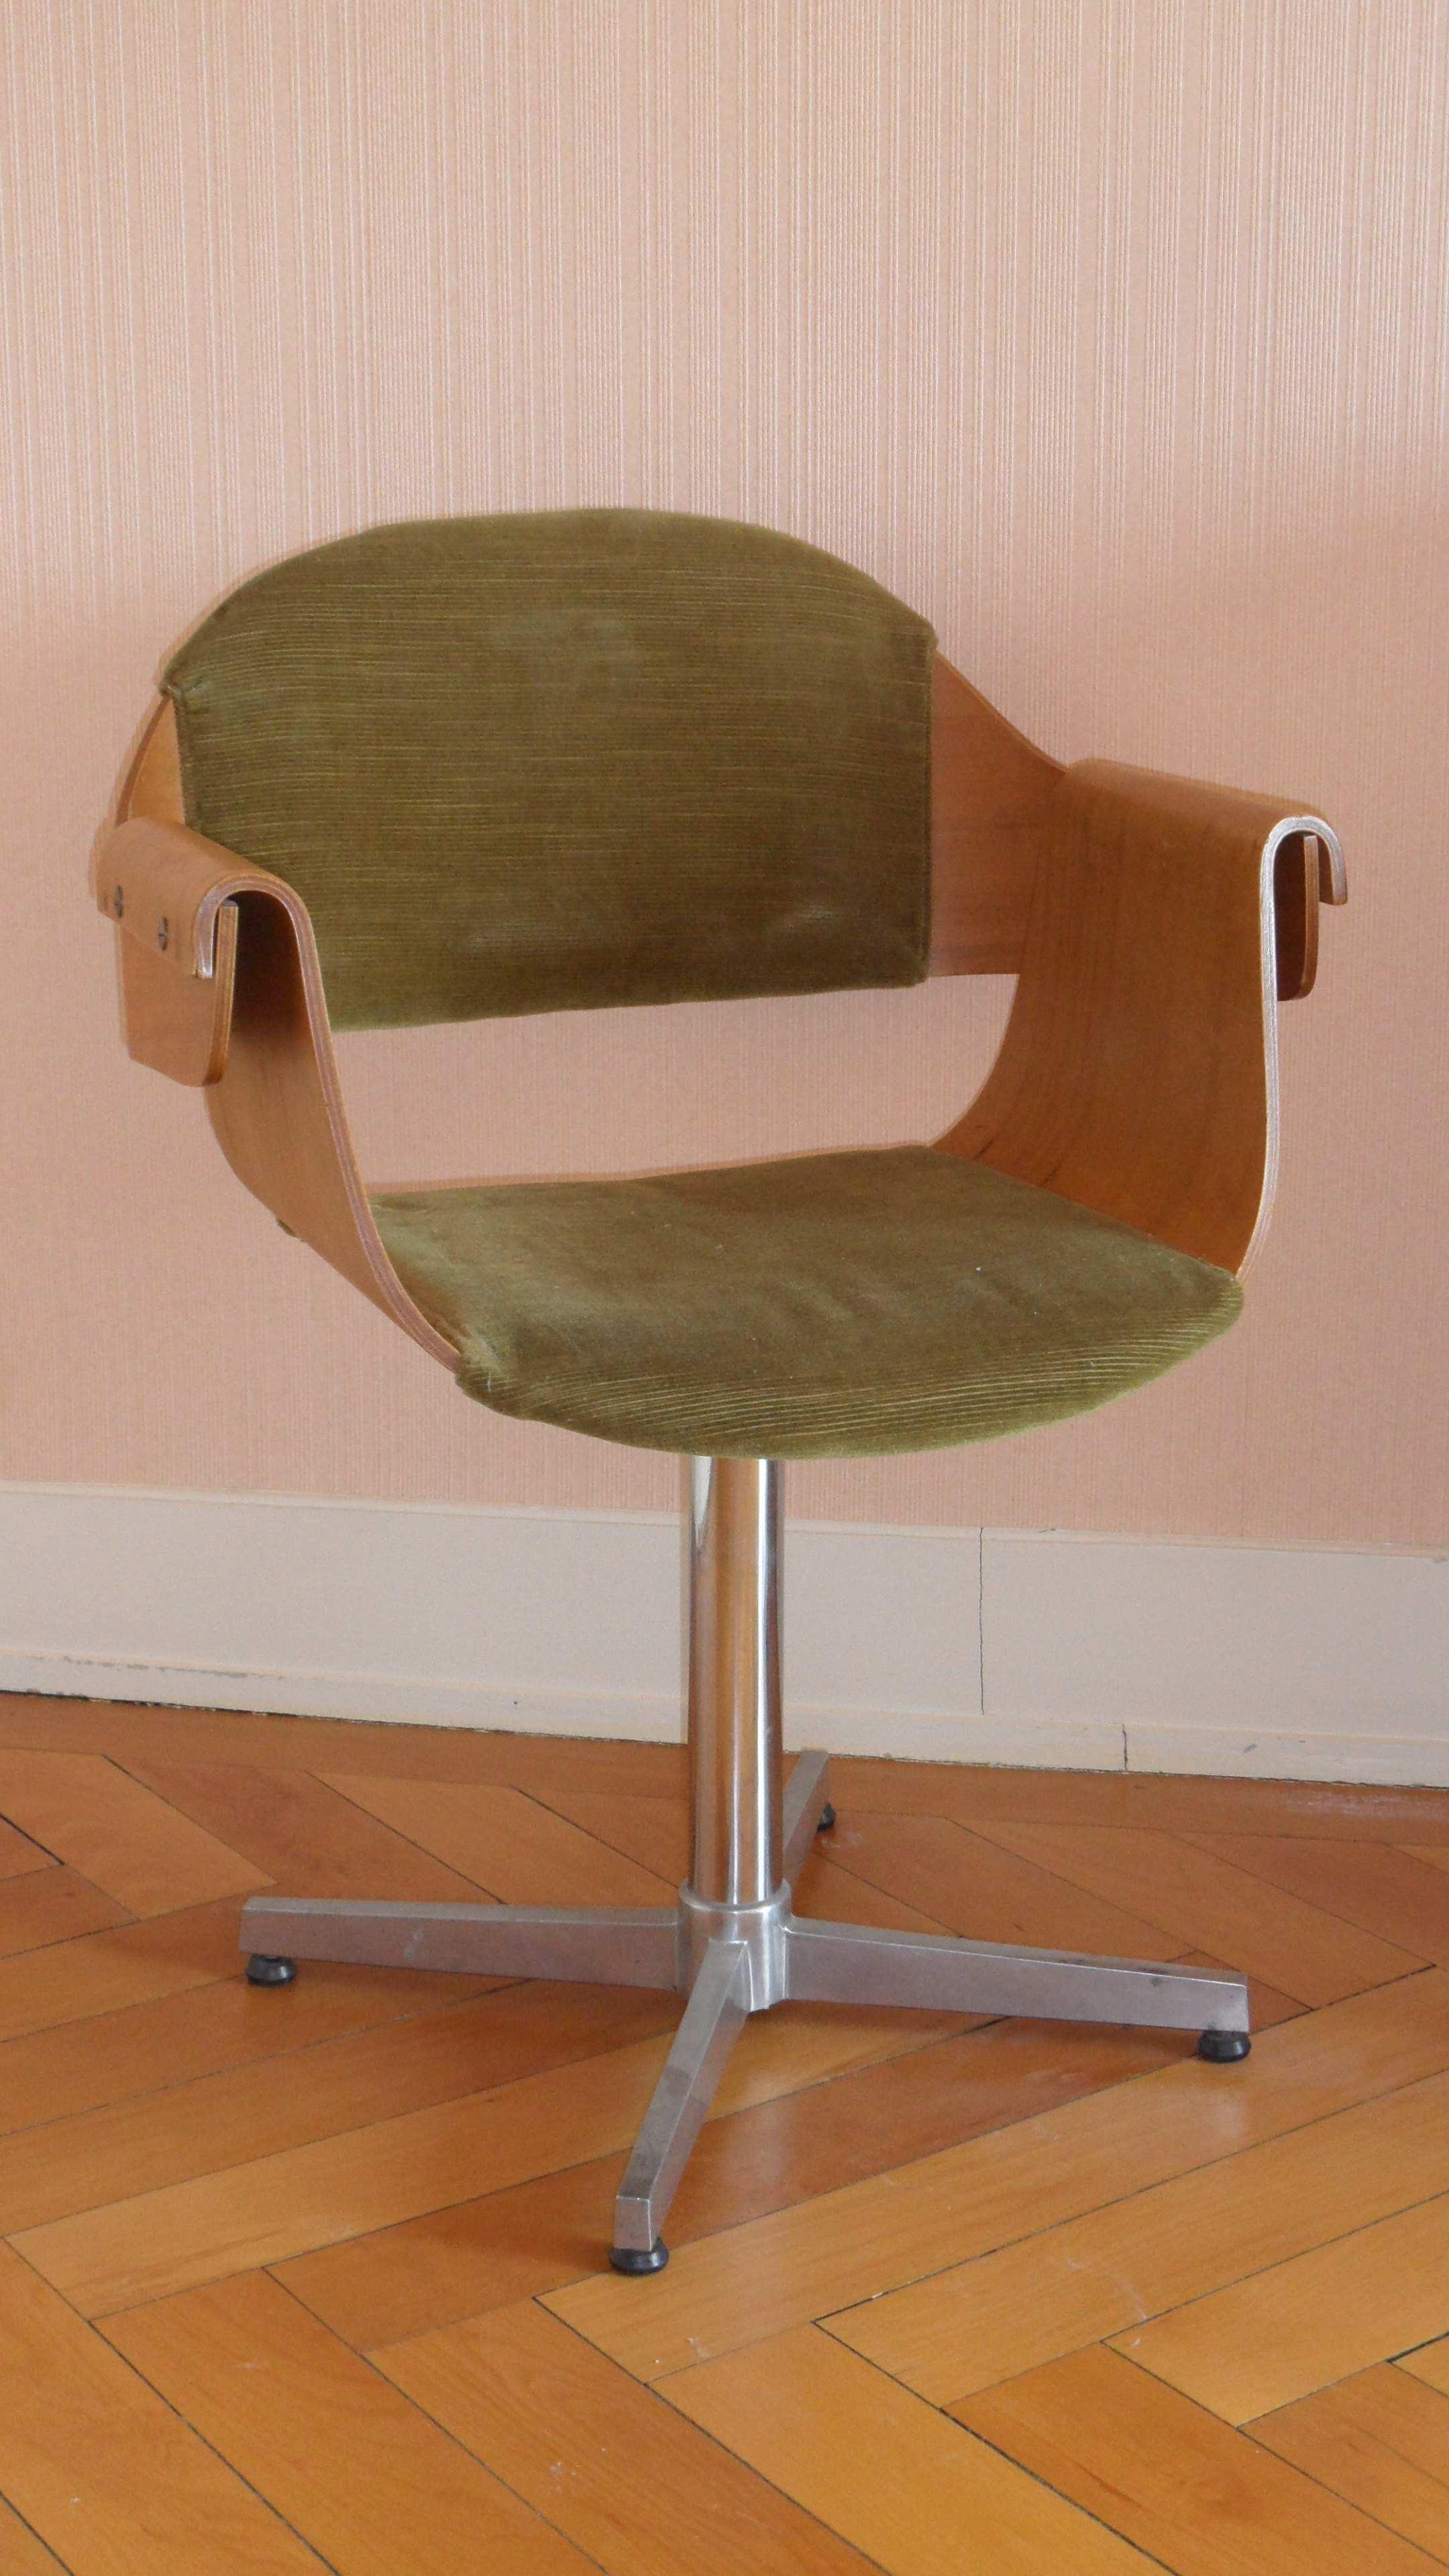 fauteuil de bureau roulette design. Black Bedroom Furniture Sets. Home Design Ideas